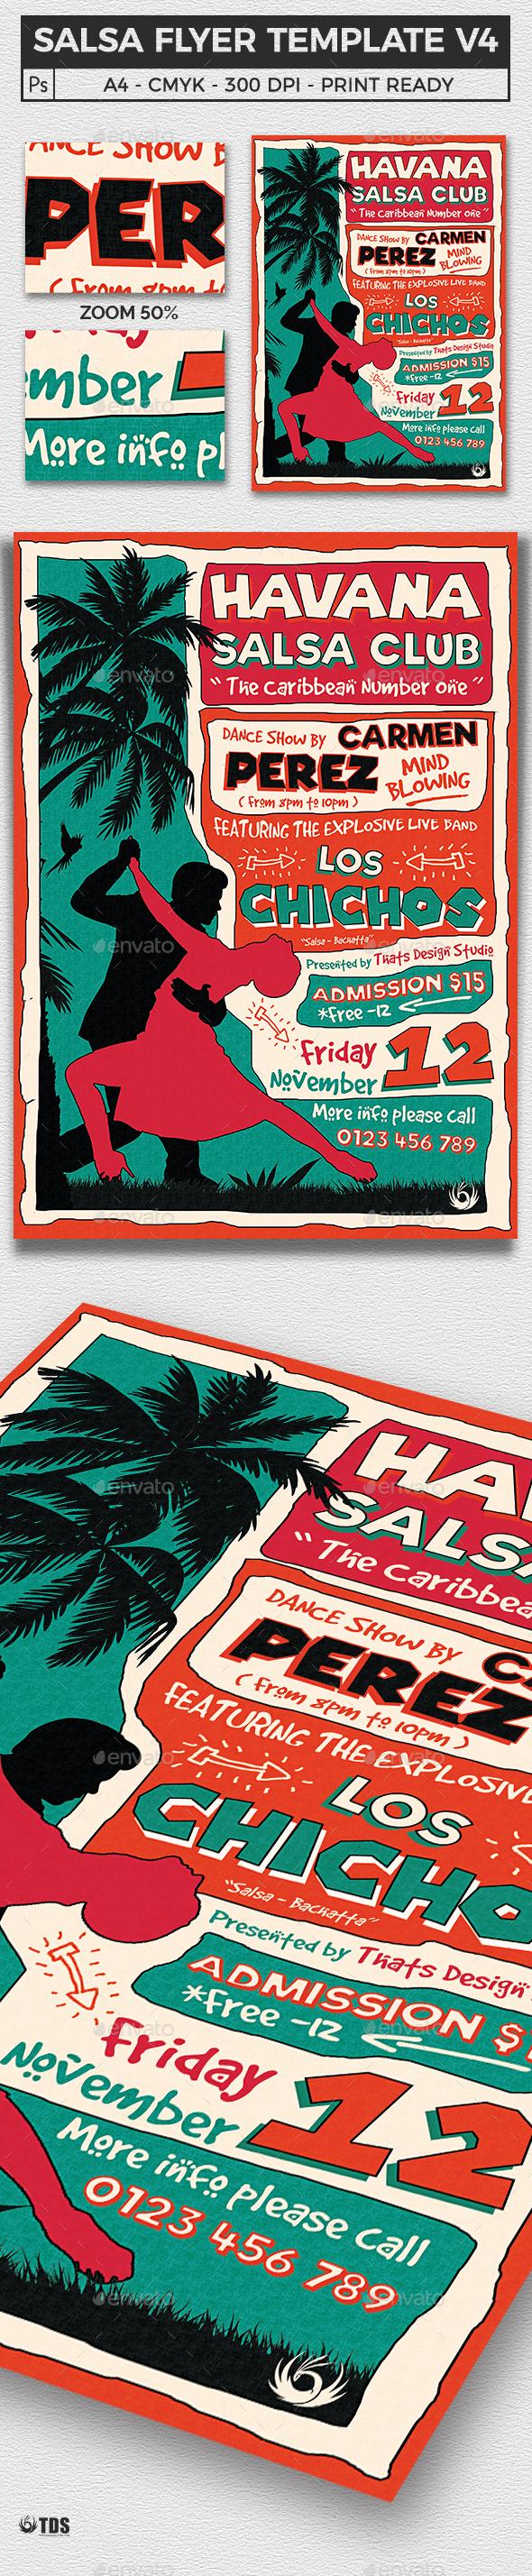 Salsa Flyer Template V4 - Events Flyers